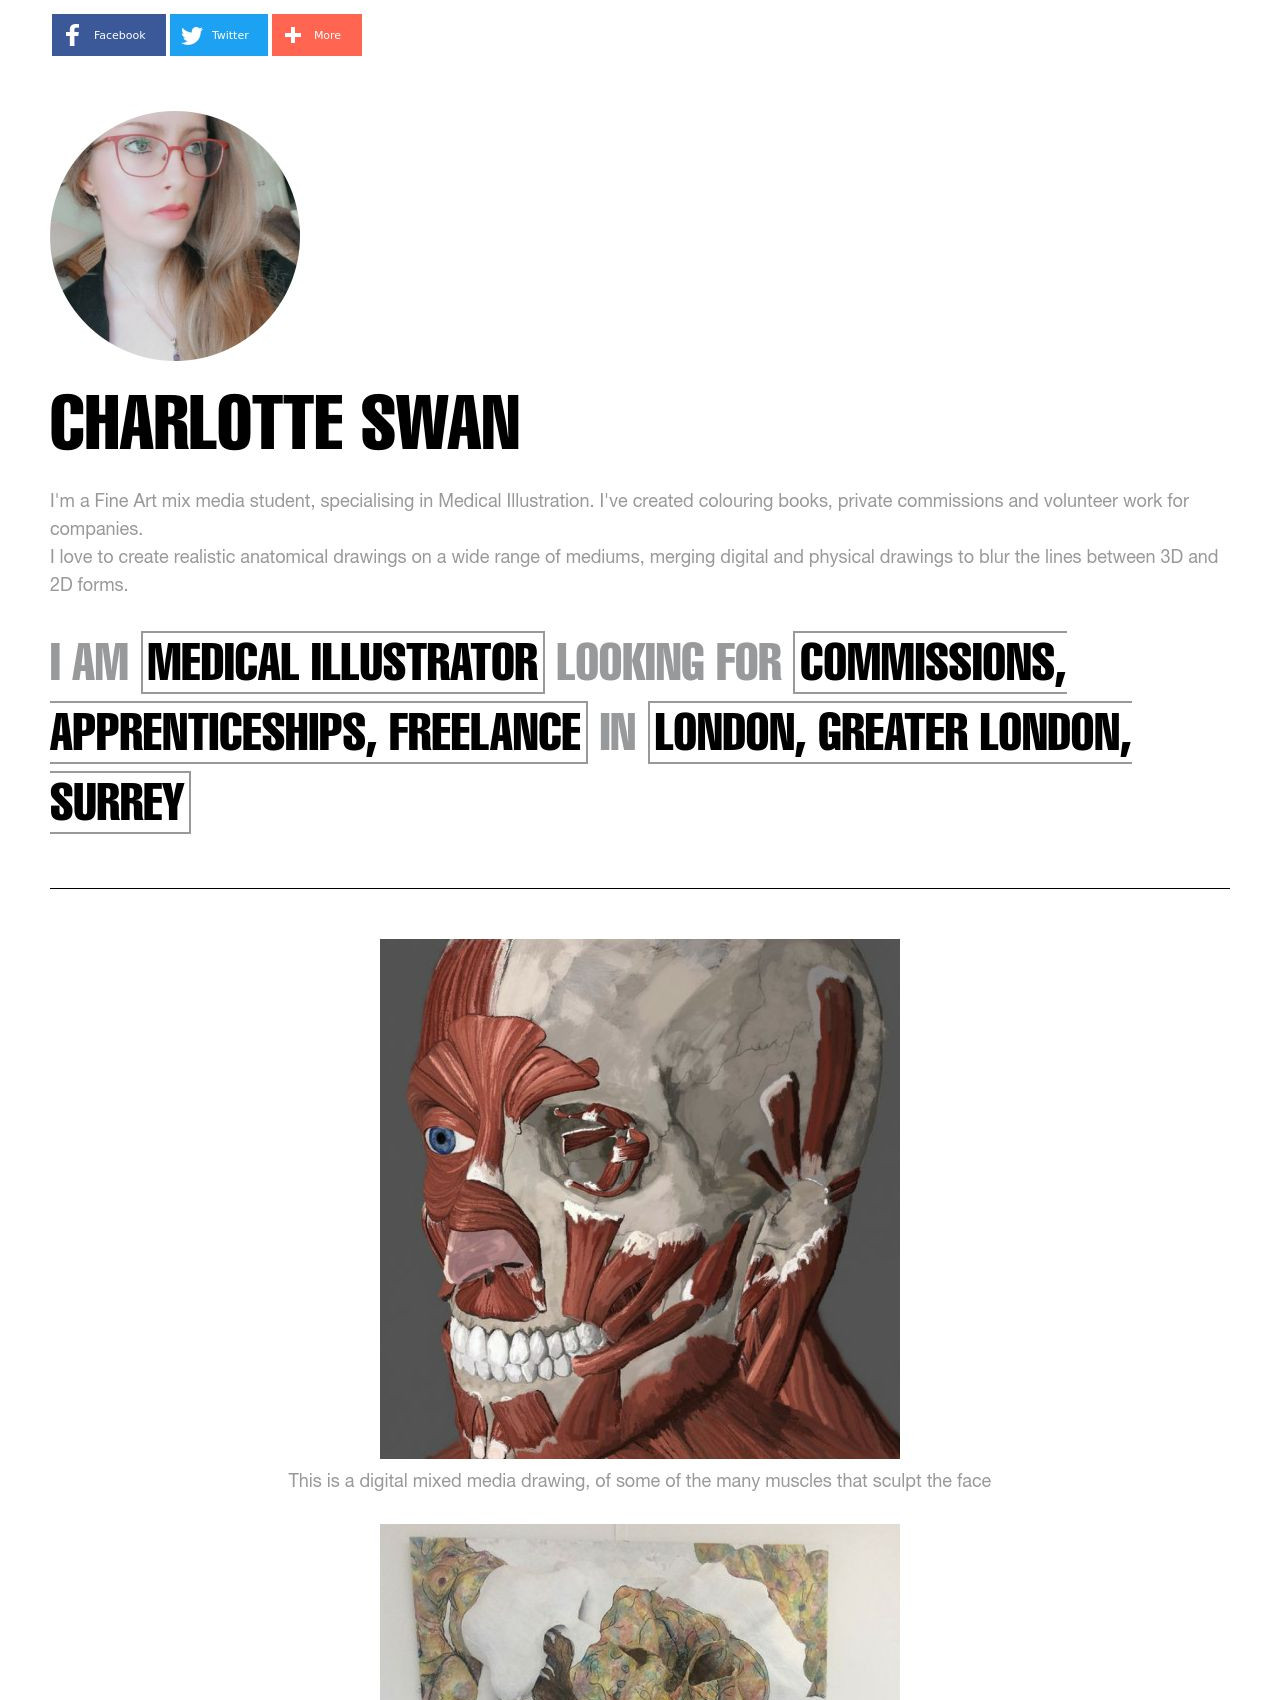 Charlotte Swan